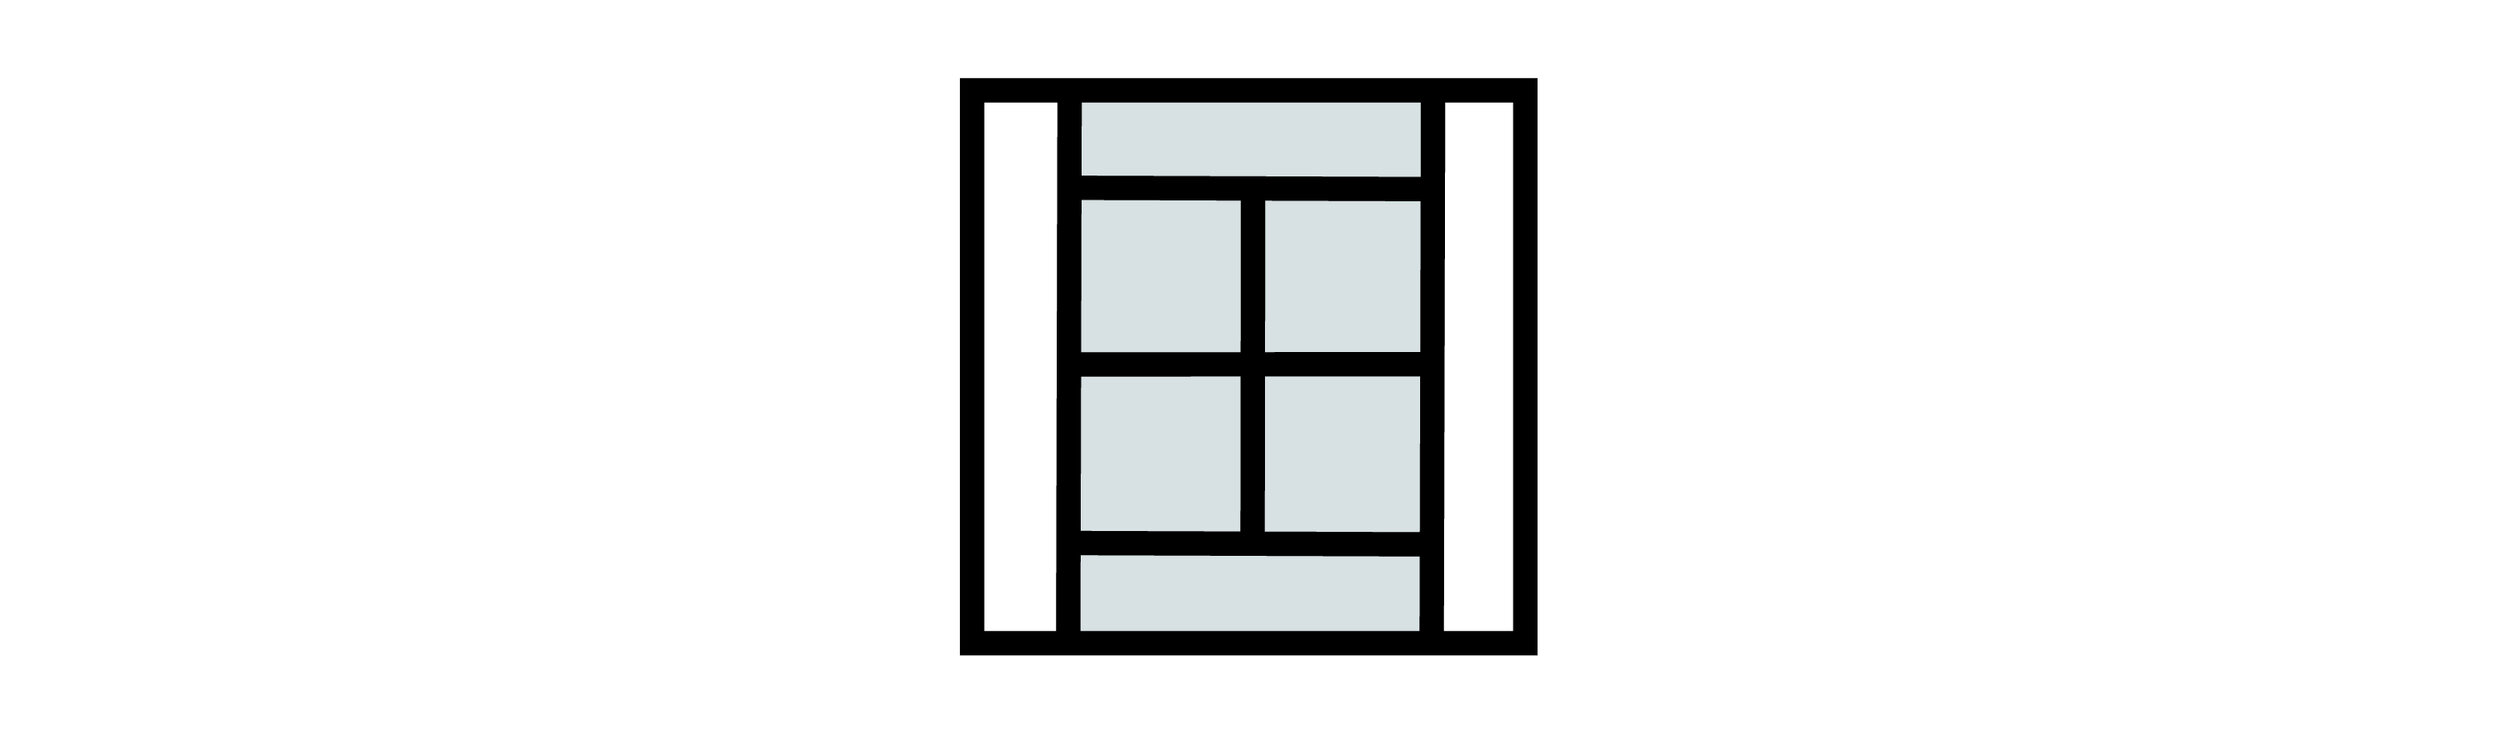 icons-31.jpg